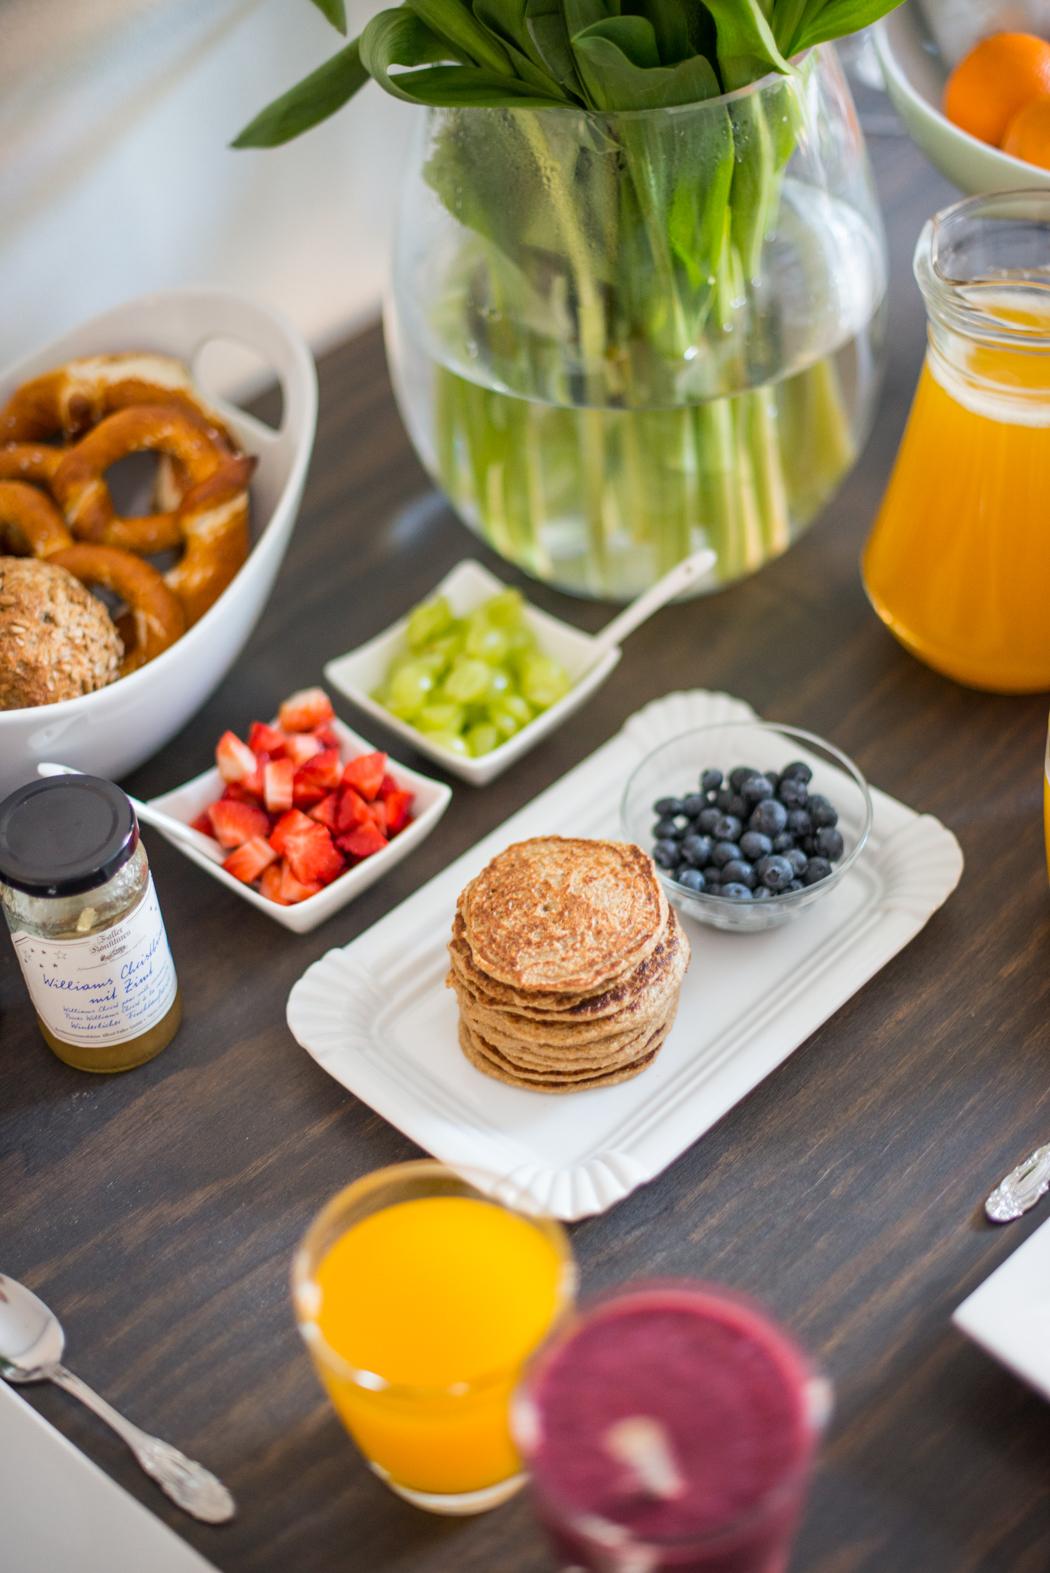 Foodblogger-München-Foodblog-Deutschland-Lindarella-veganes-Frühstück-Frühstücksinspiration-vegane-Pancakes-Clean-Eating-3